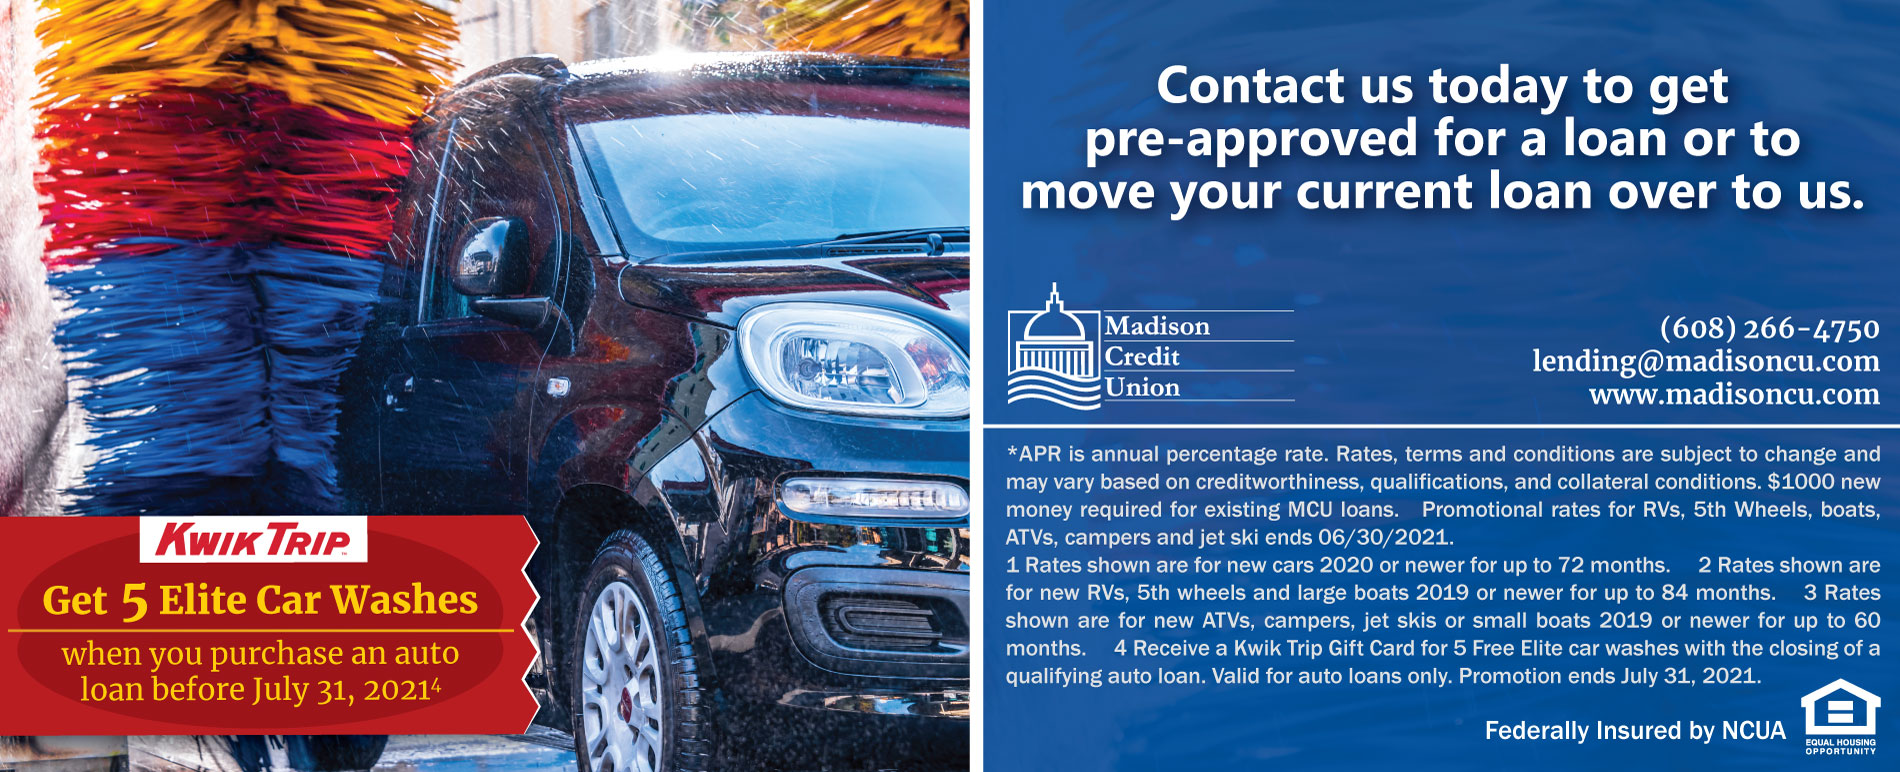 Free Car Wash Promotion